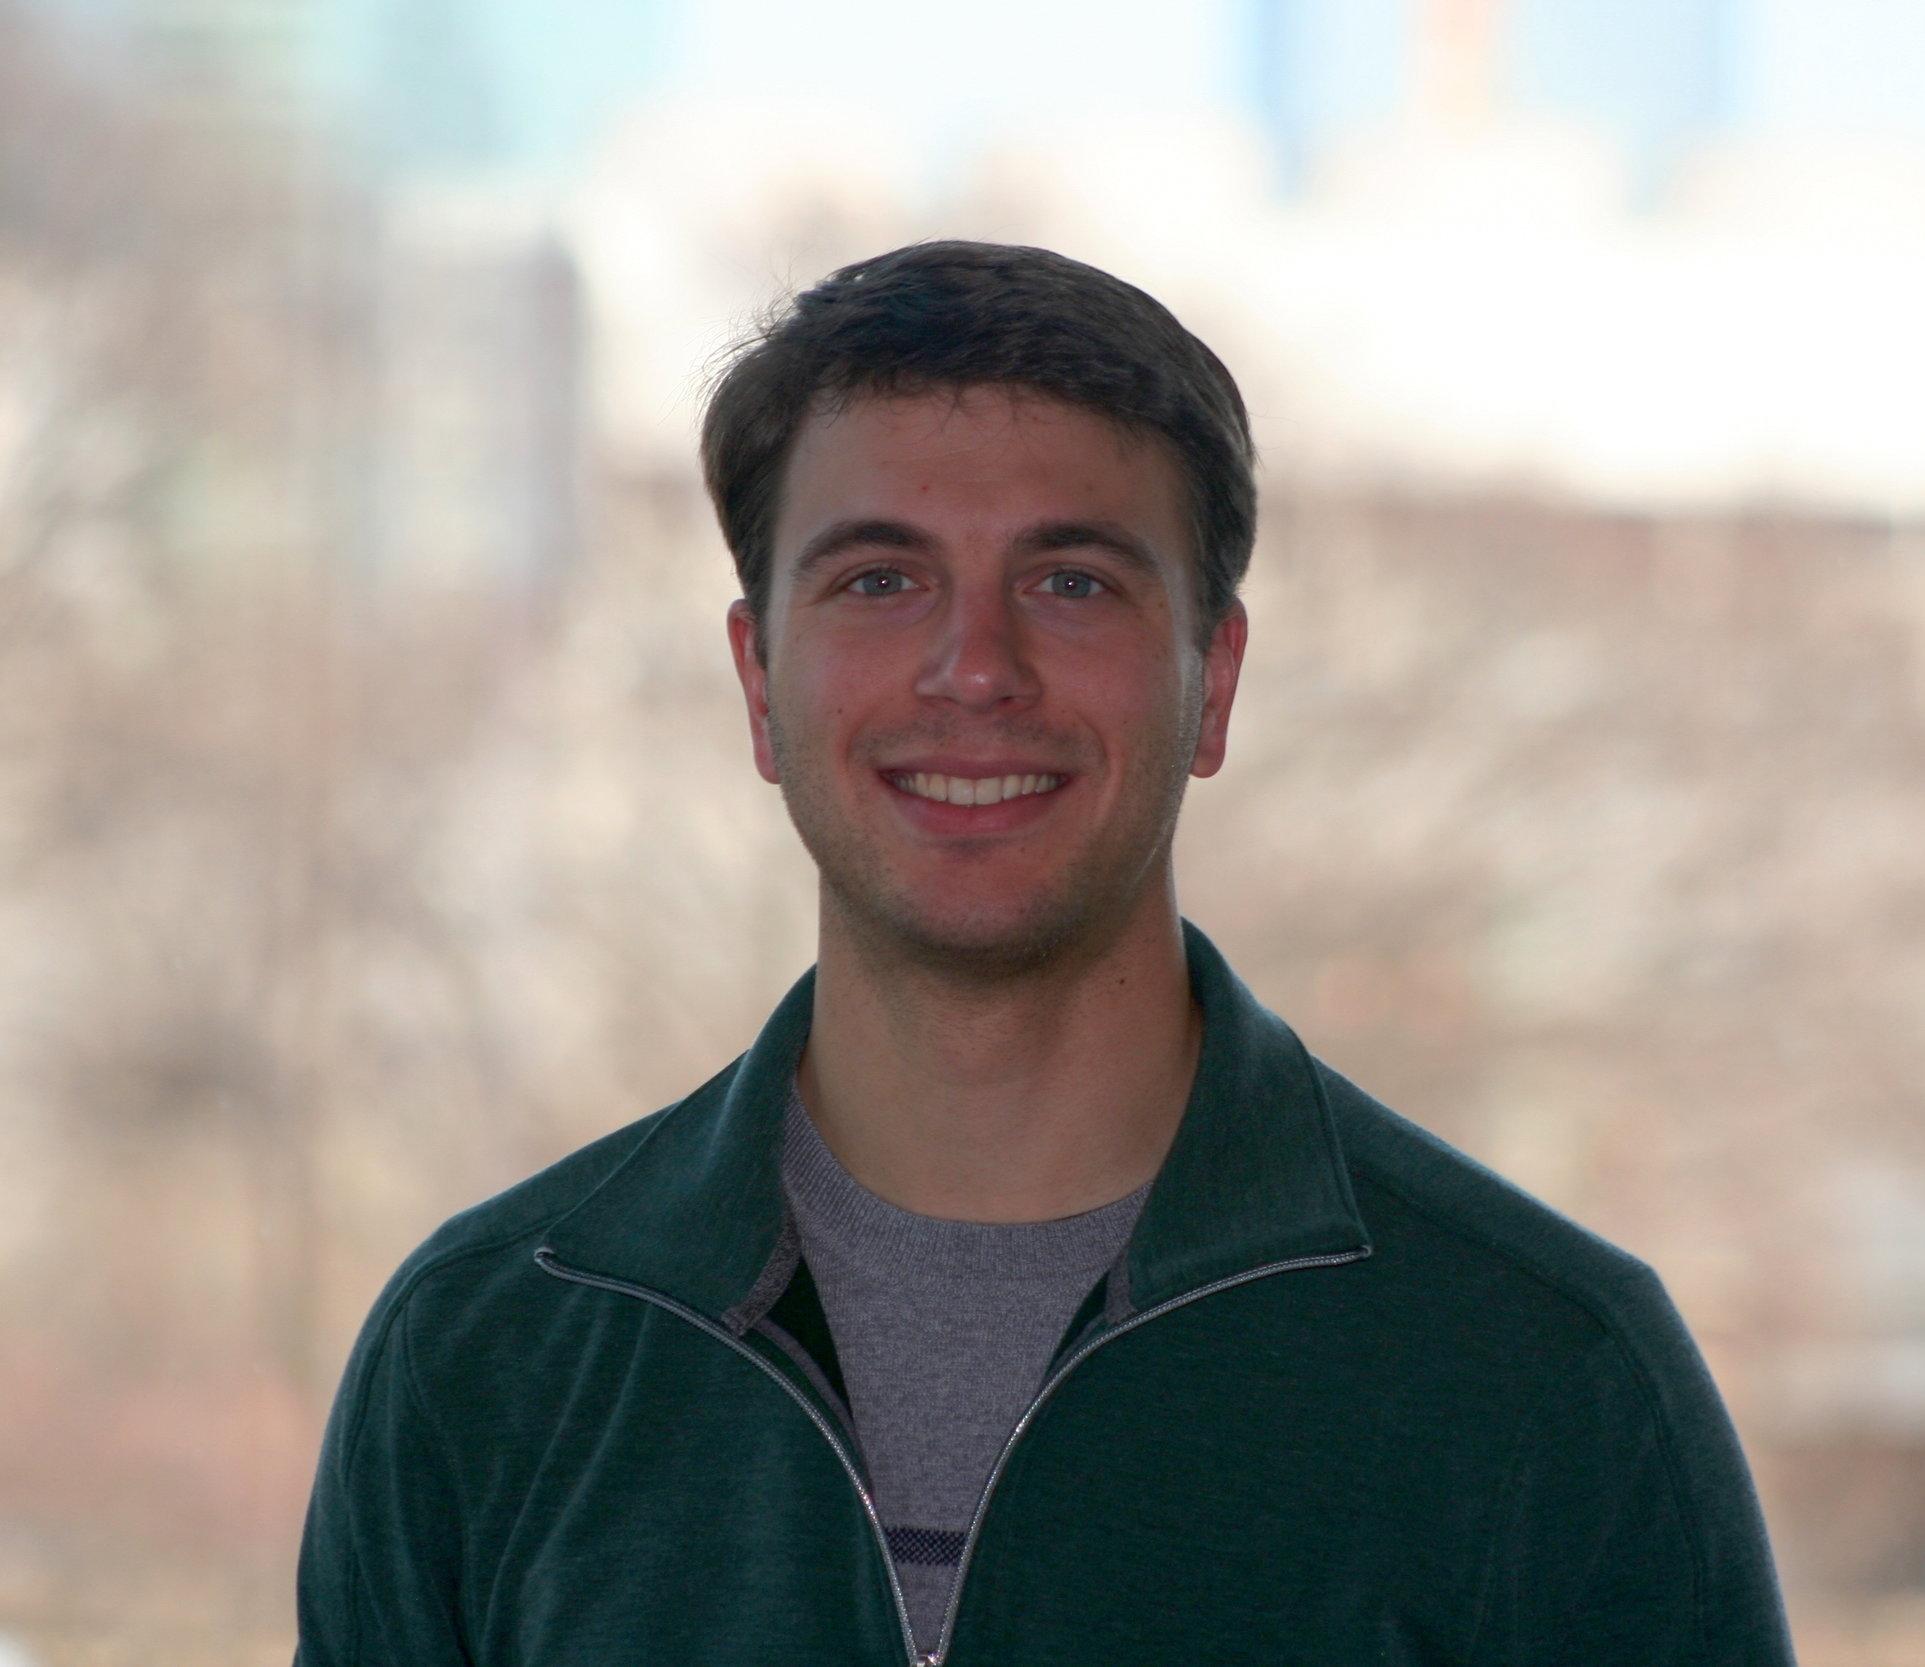 Matt Piccoli, PhD student at the University of Pennsylvania.